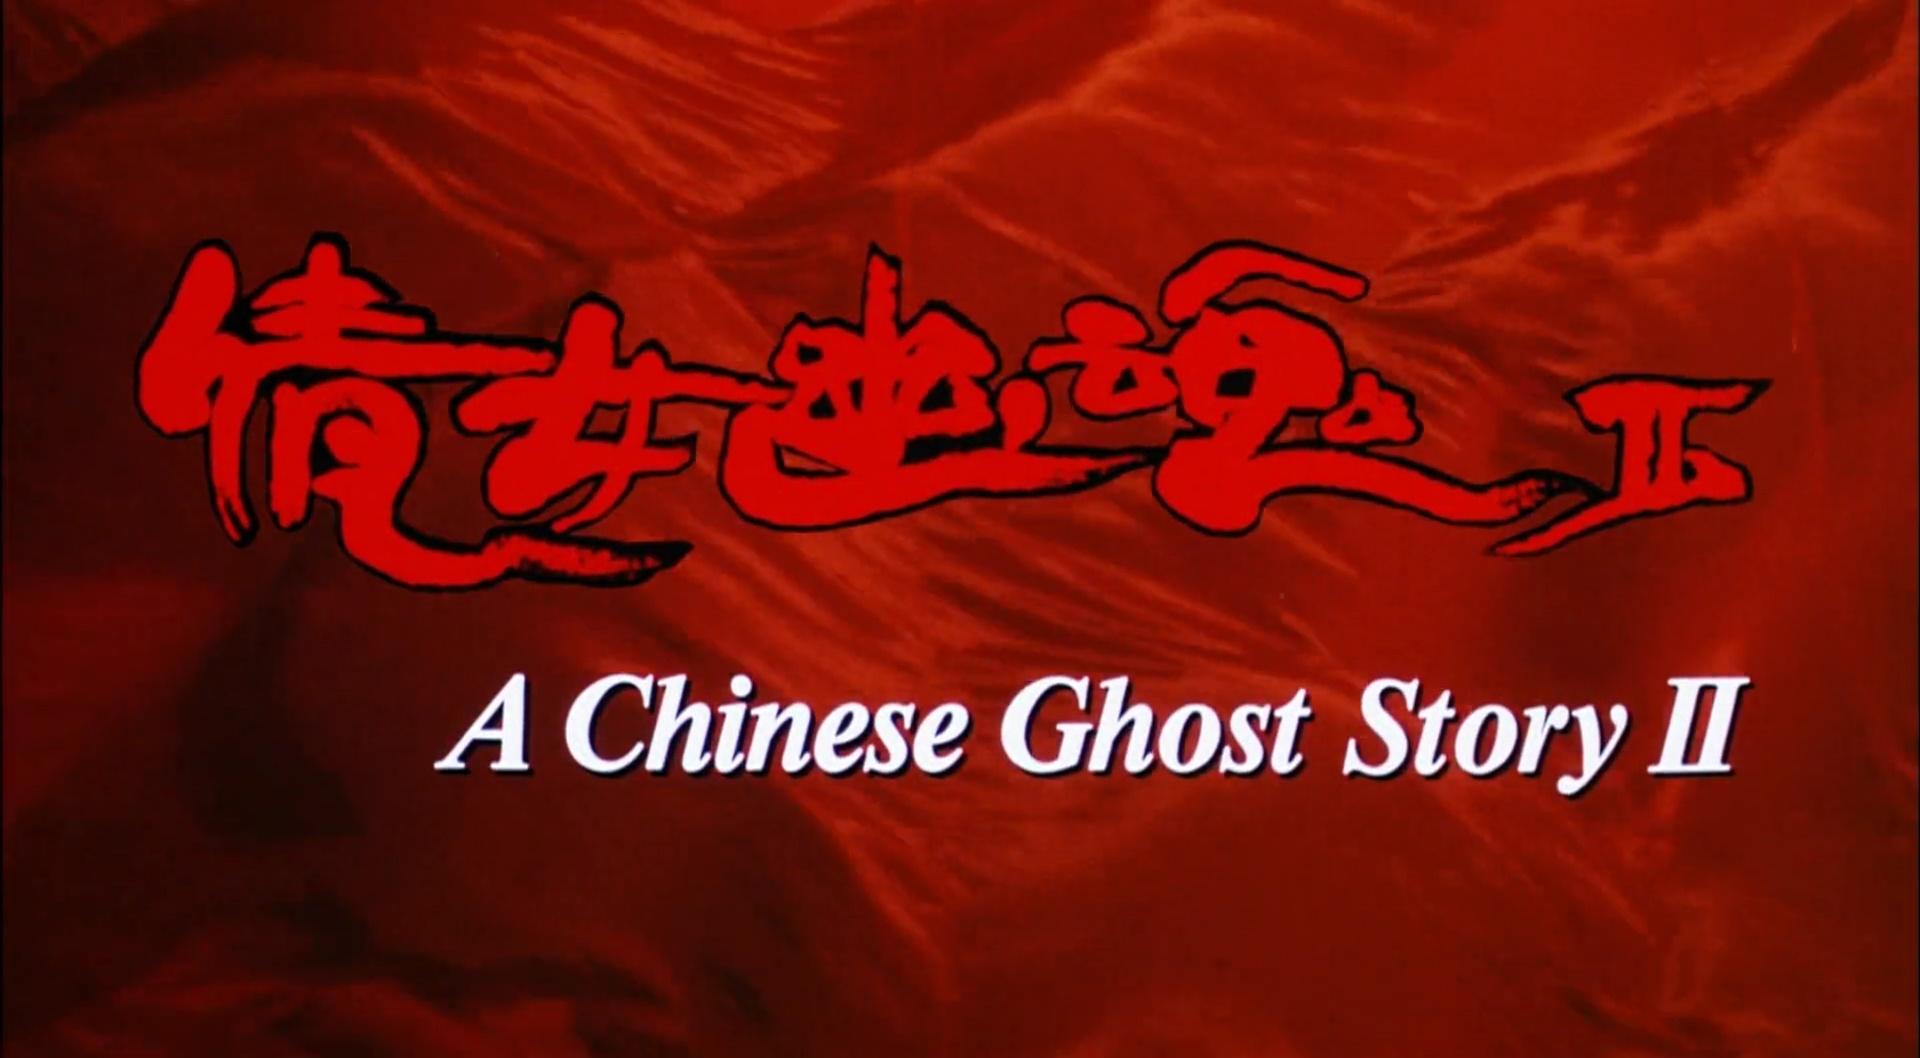 HISTOIRES DE FANTÔMES CHINOIS 2 (倩女幽魂 II:人間道) de Ching Siu Tung (1990)